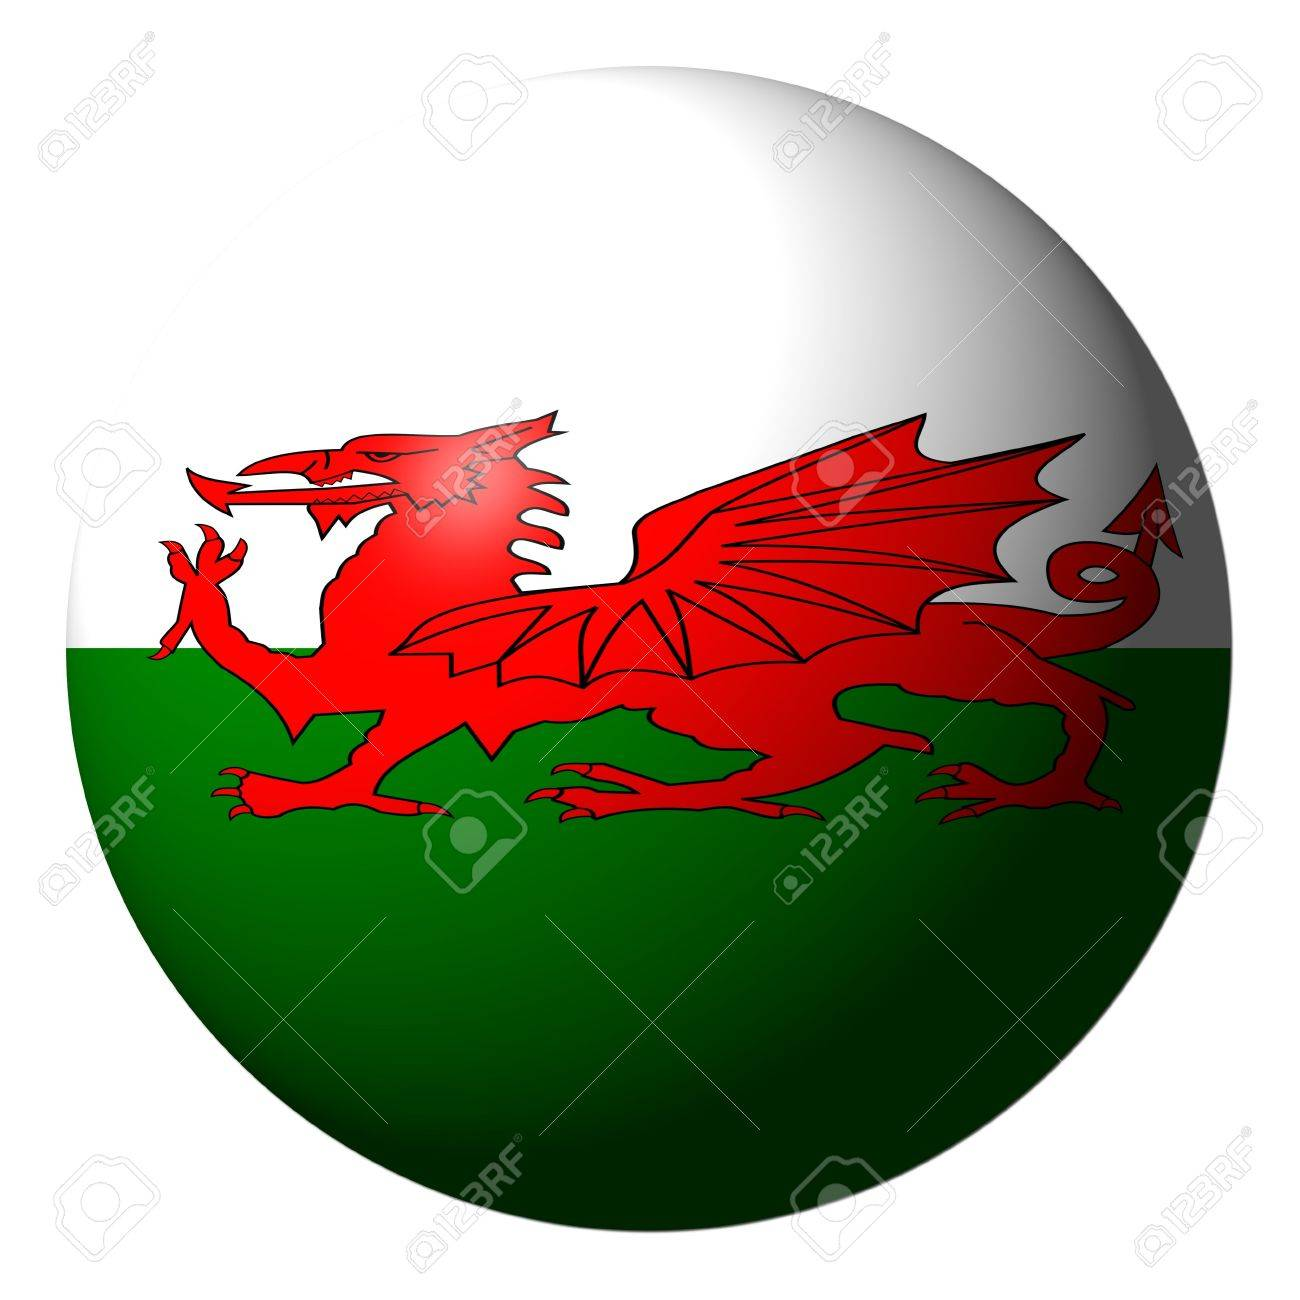 Welsh Flag Sphere Isolated On White Illustration Stock Photo ...